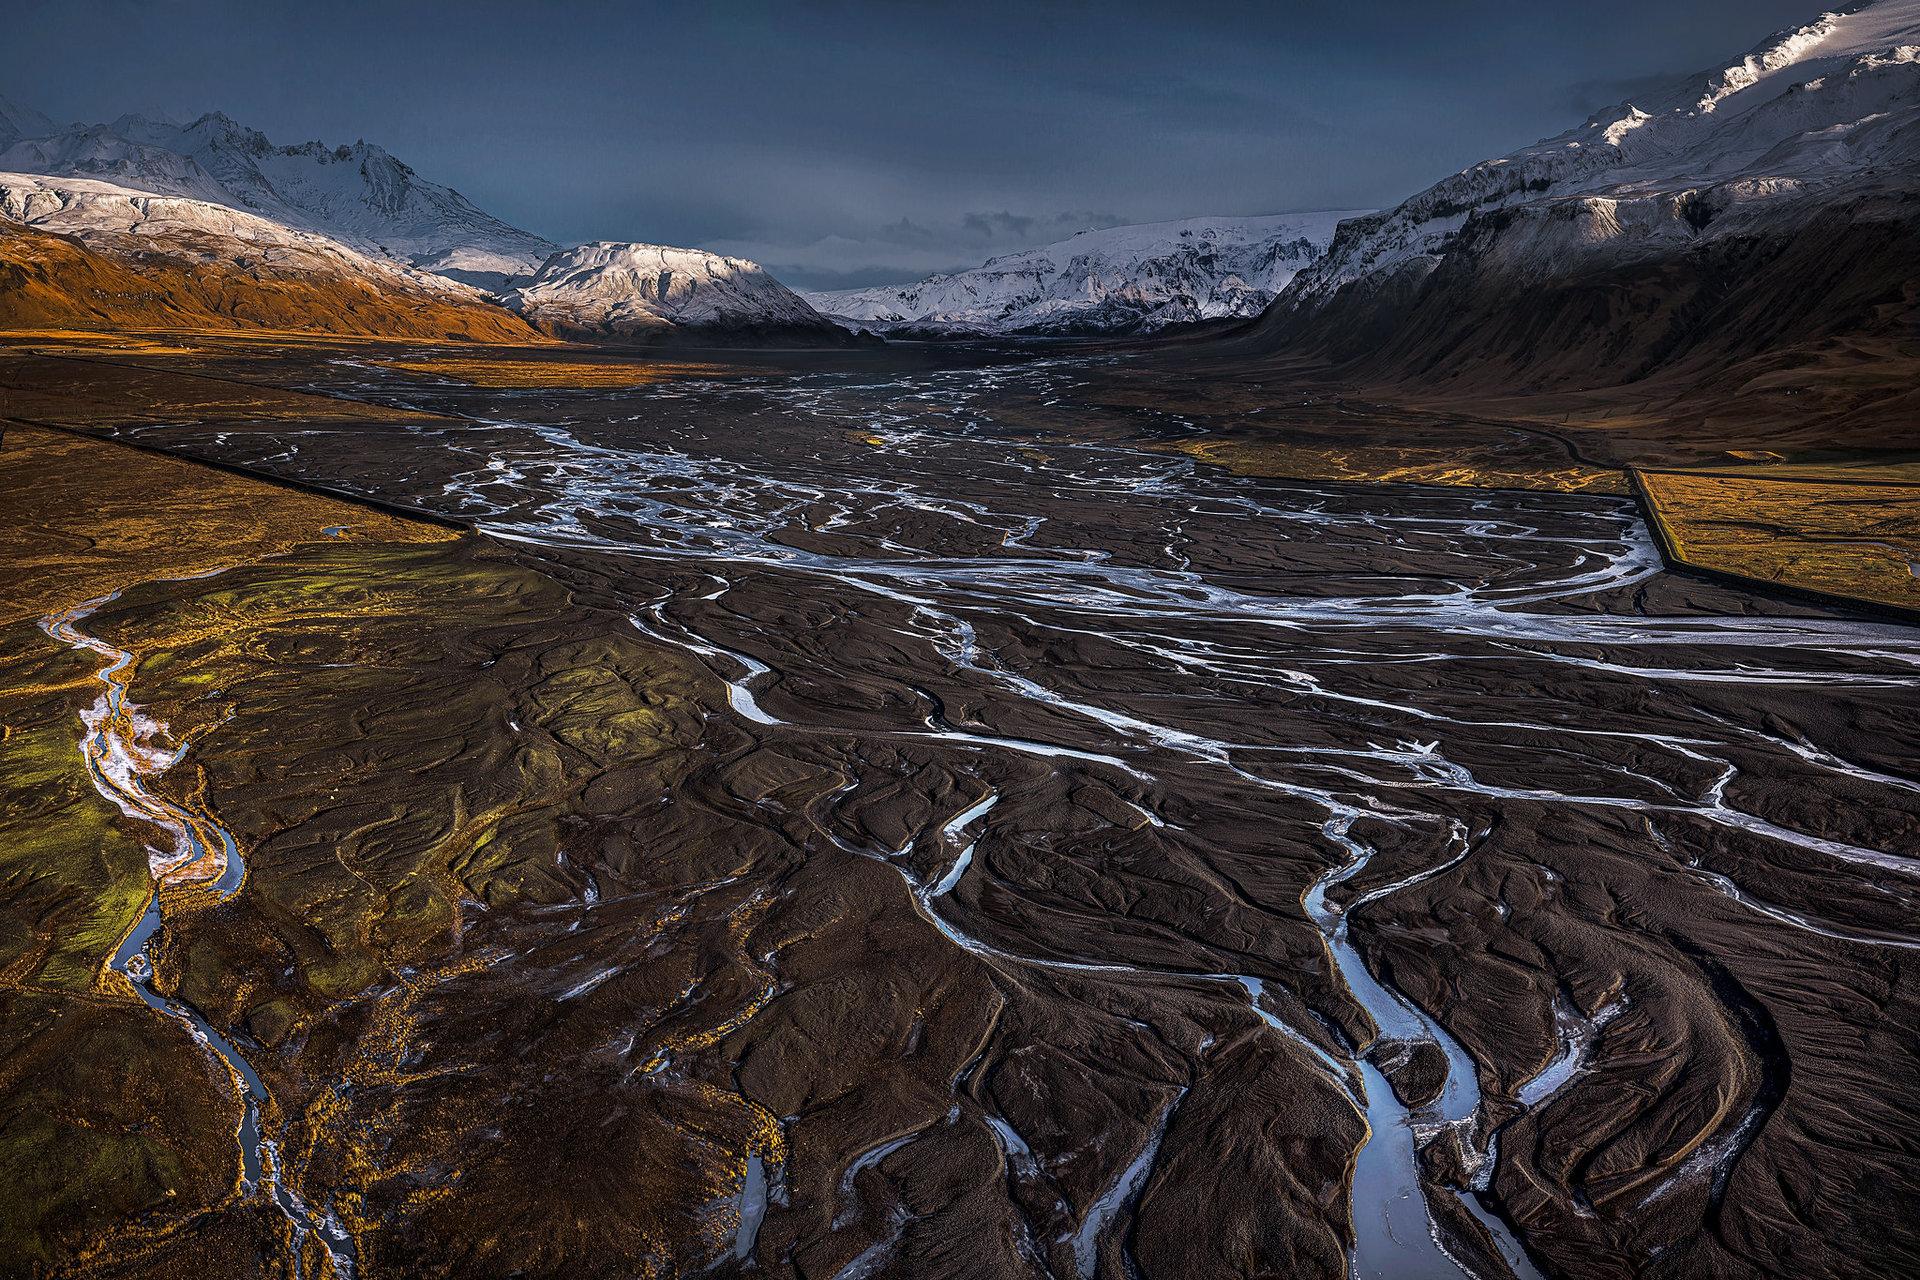 Ледникови реки от ледника Eyjafjallajökull   Author sakuraki   PHOTO FORUM